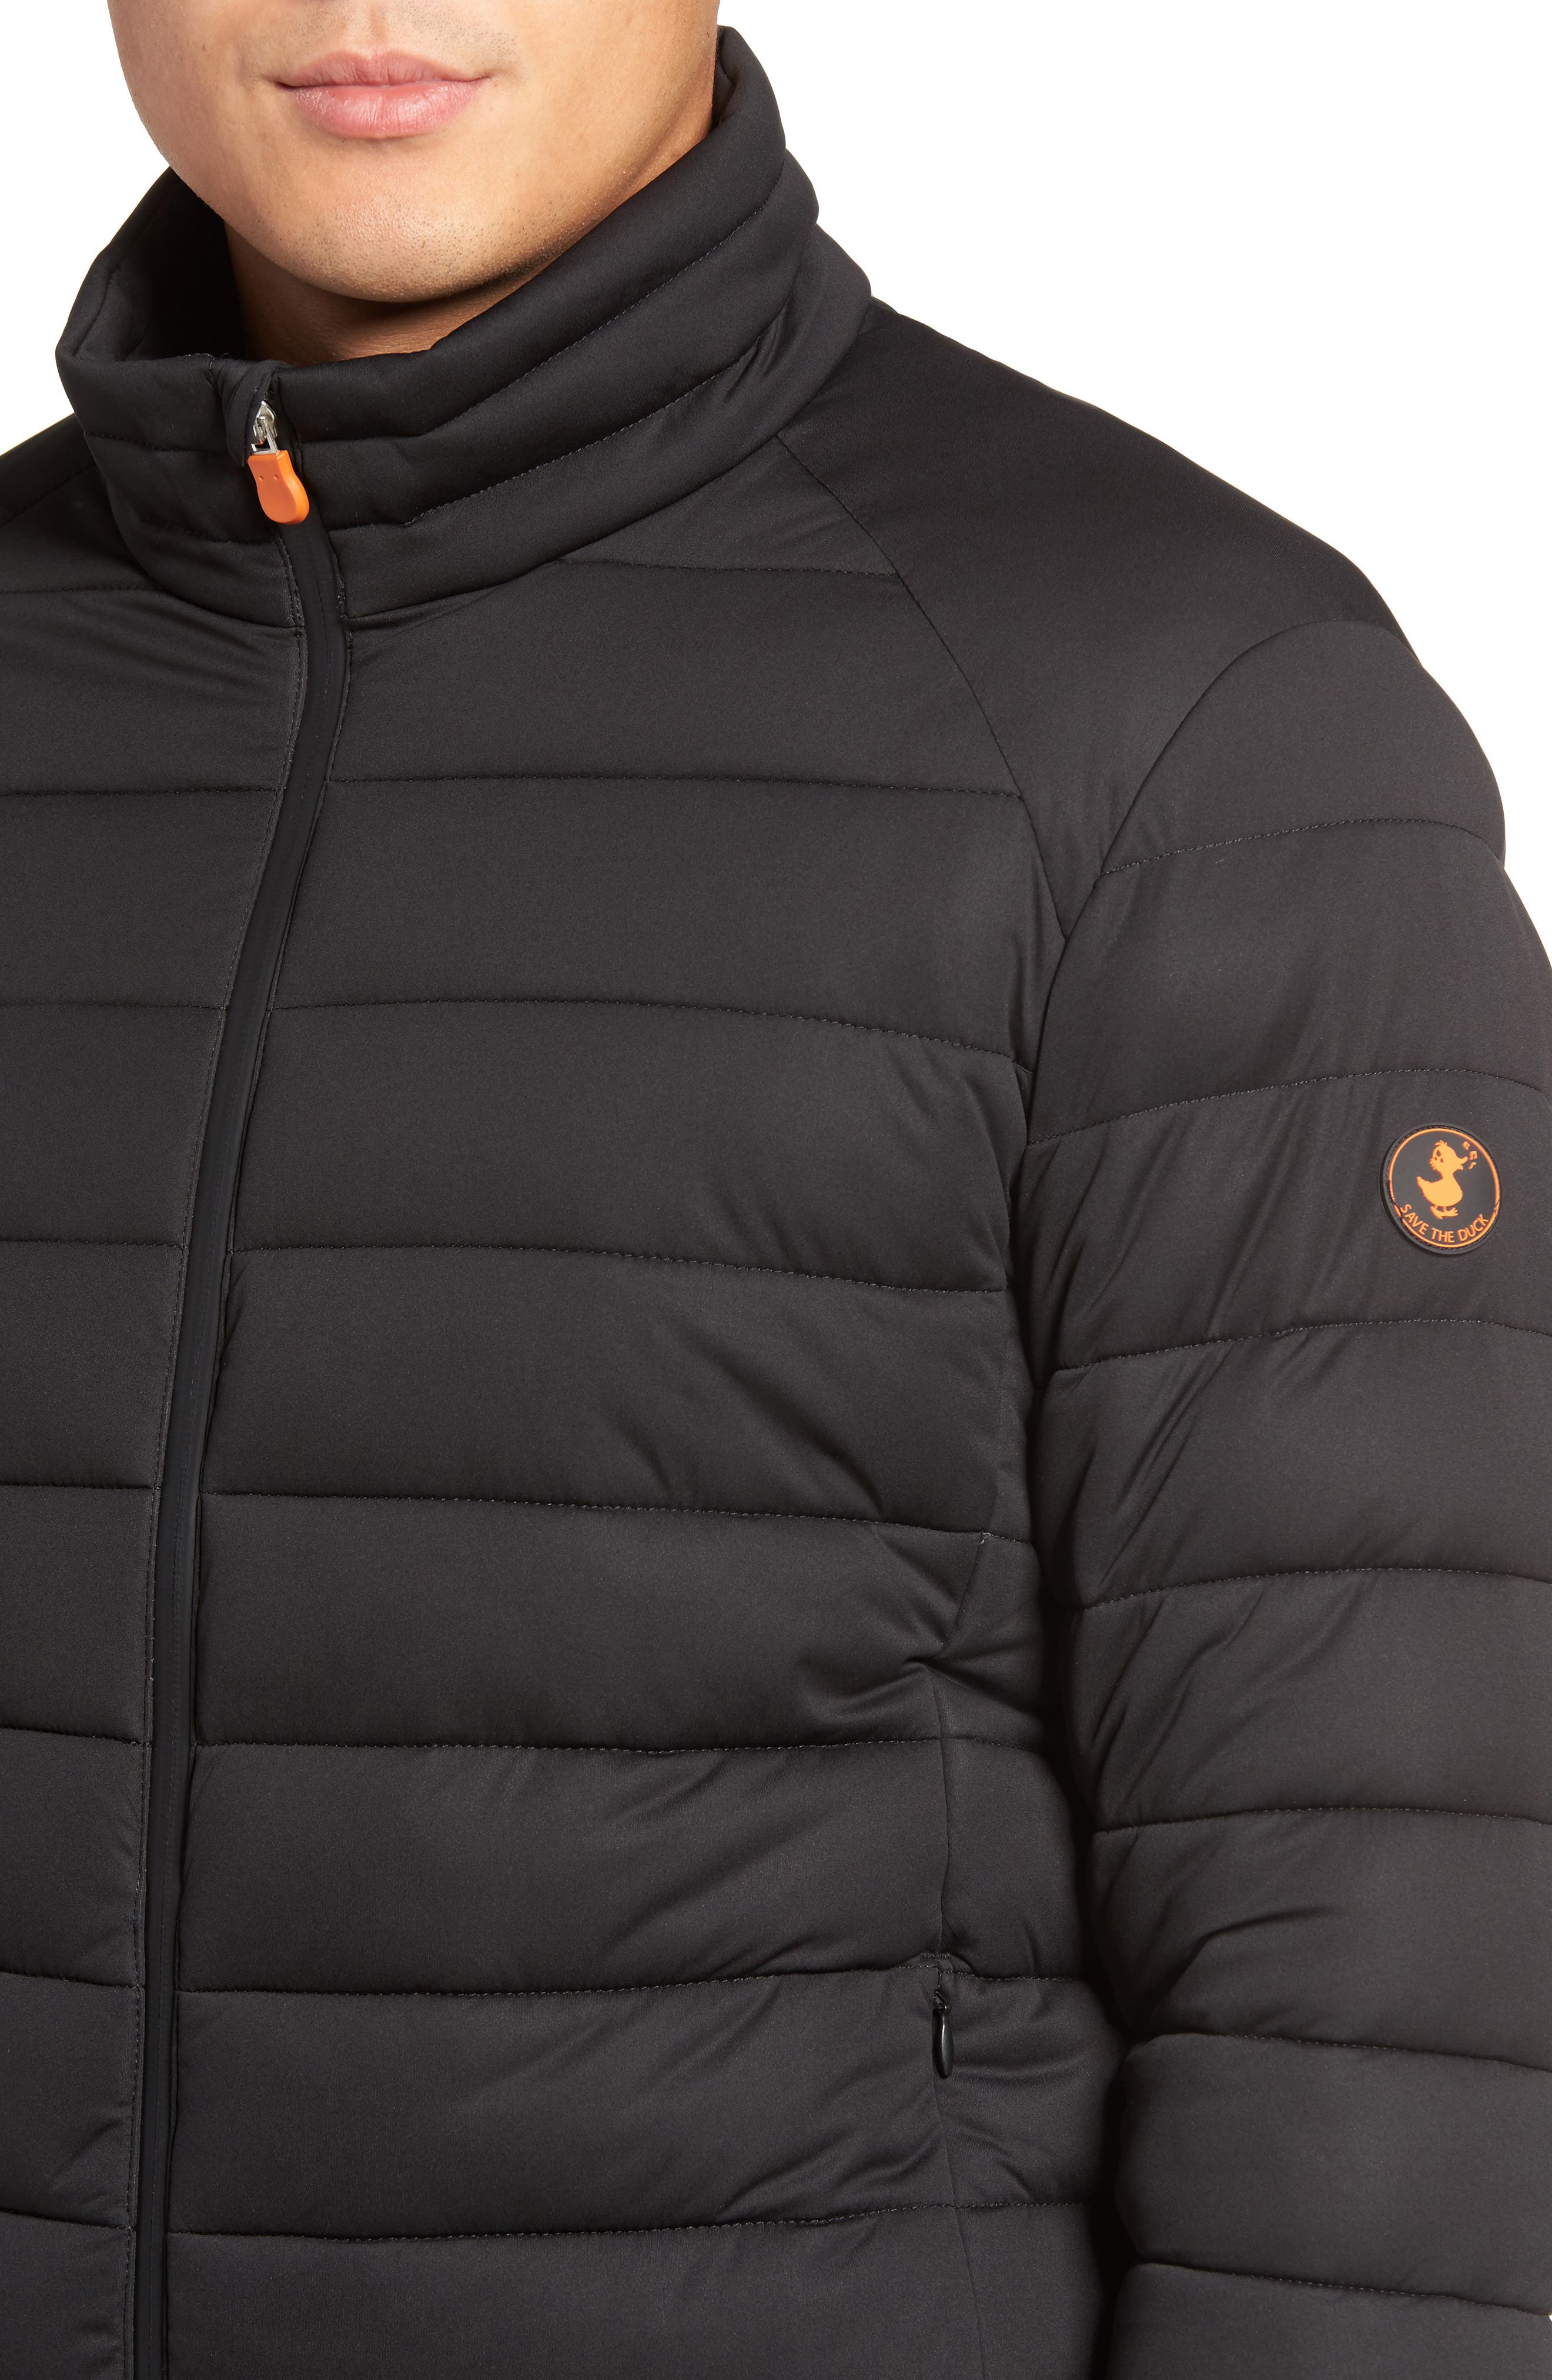 Puffer Jacket,                             Alternate thumbnail 4, color,                             001